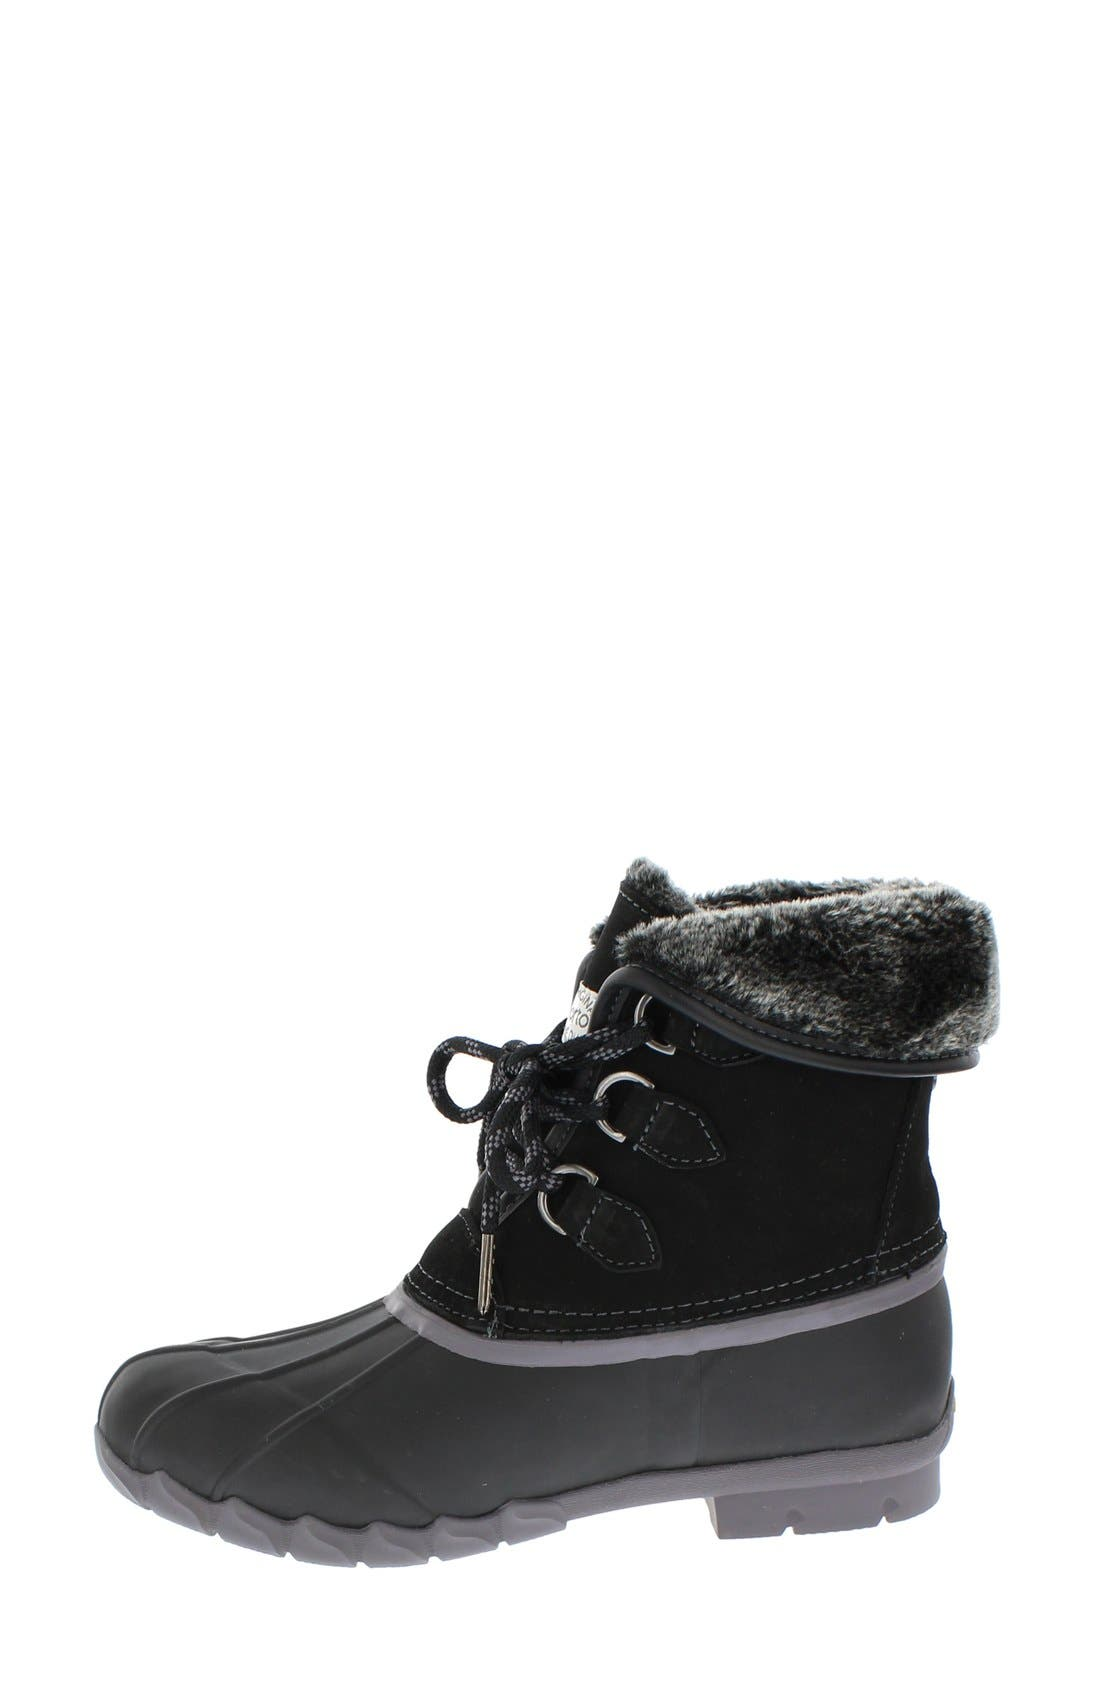 Defrost Faux Fur Lined Duck Boot,                             Alternate thumbnail 2, color,                             Black/ Black